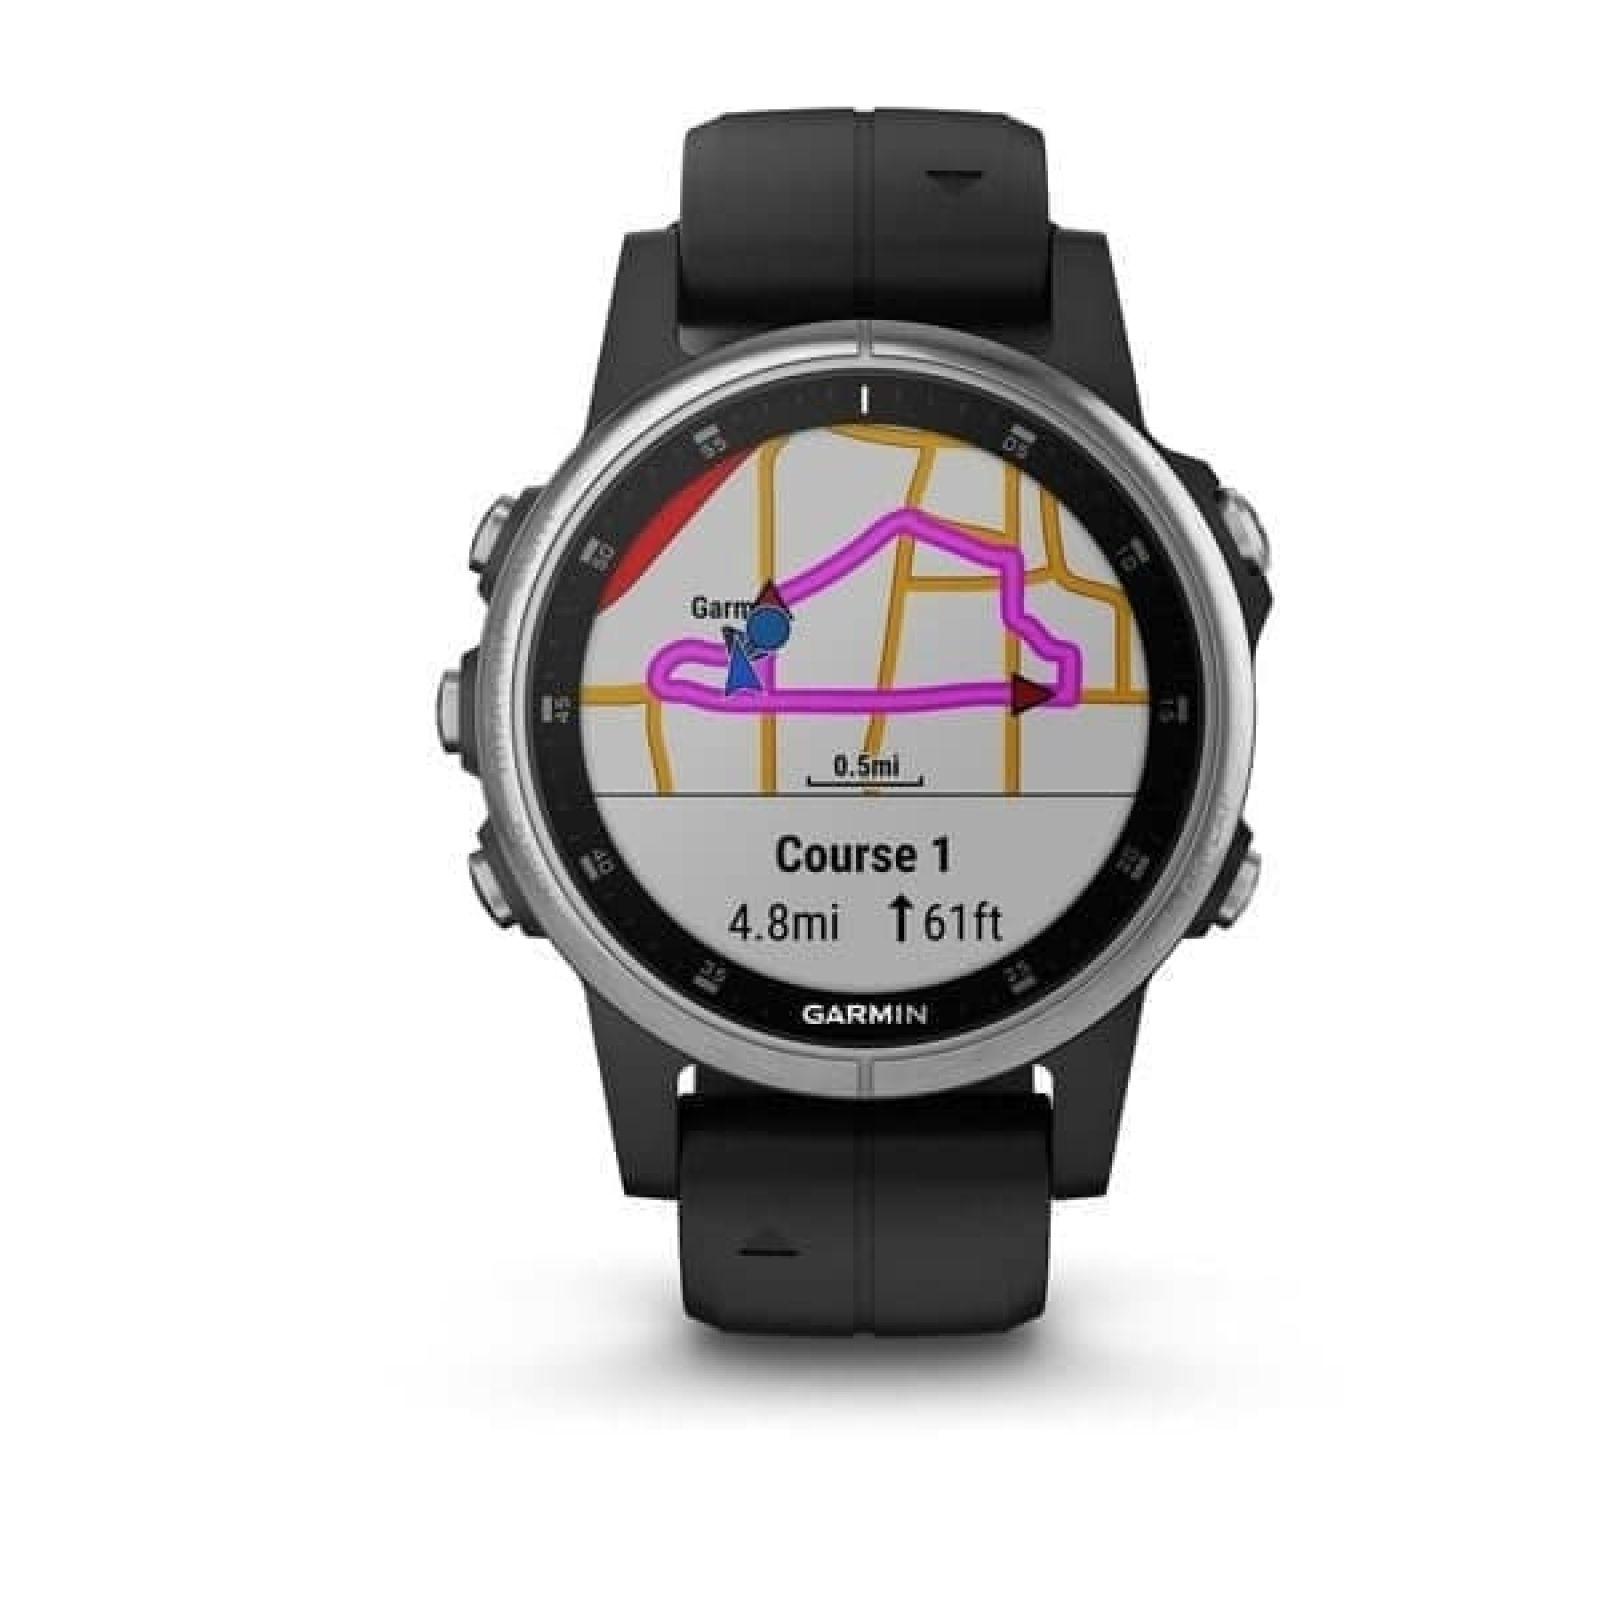 Garmin fenix 5S Plus новые GPS часы